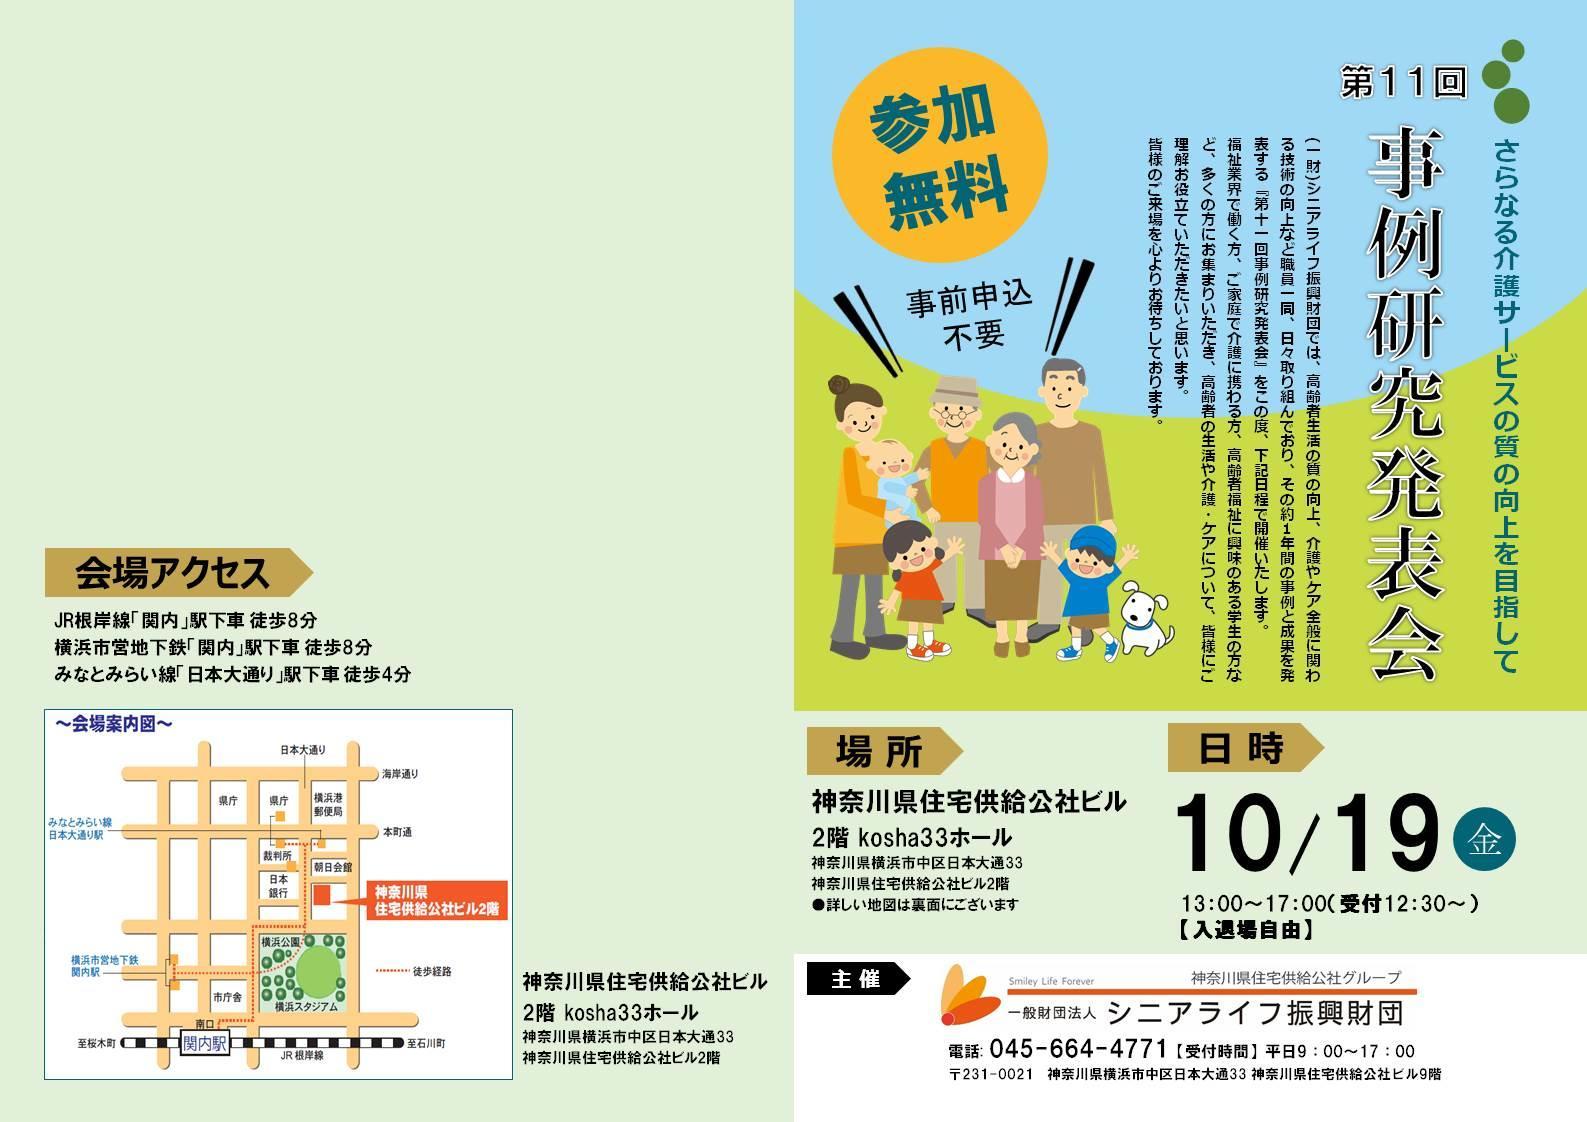 Case study presentation181019_1.JPG